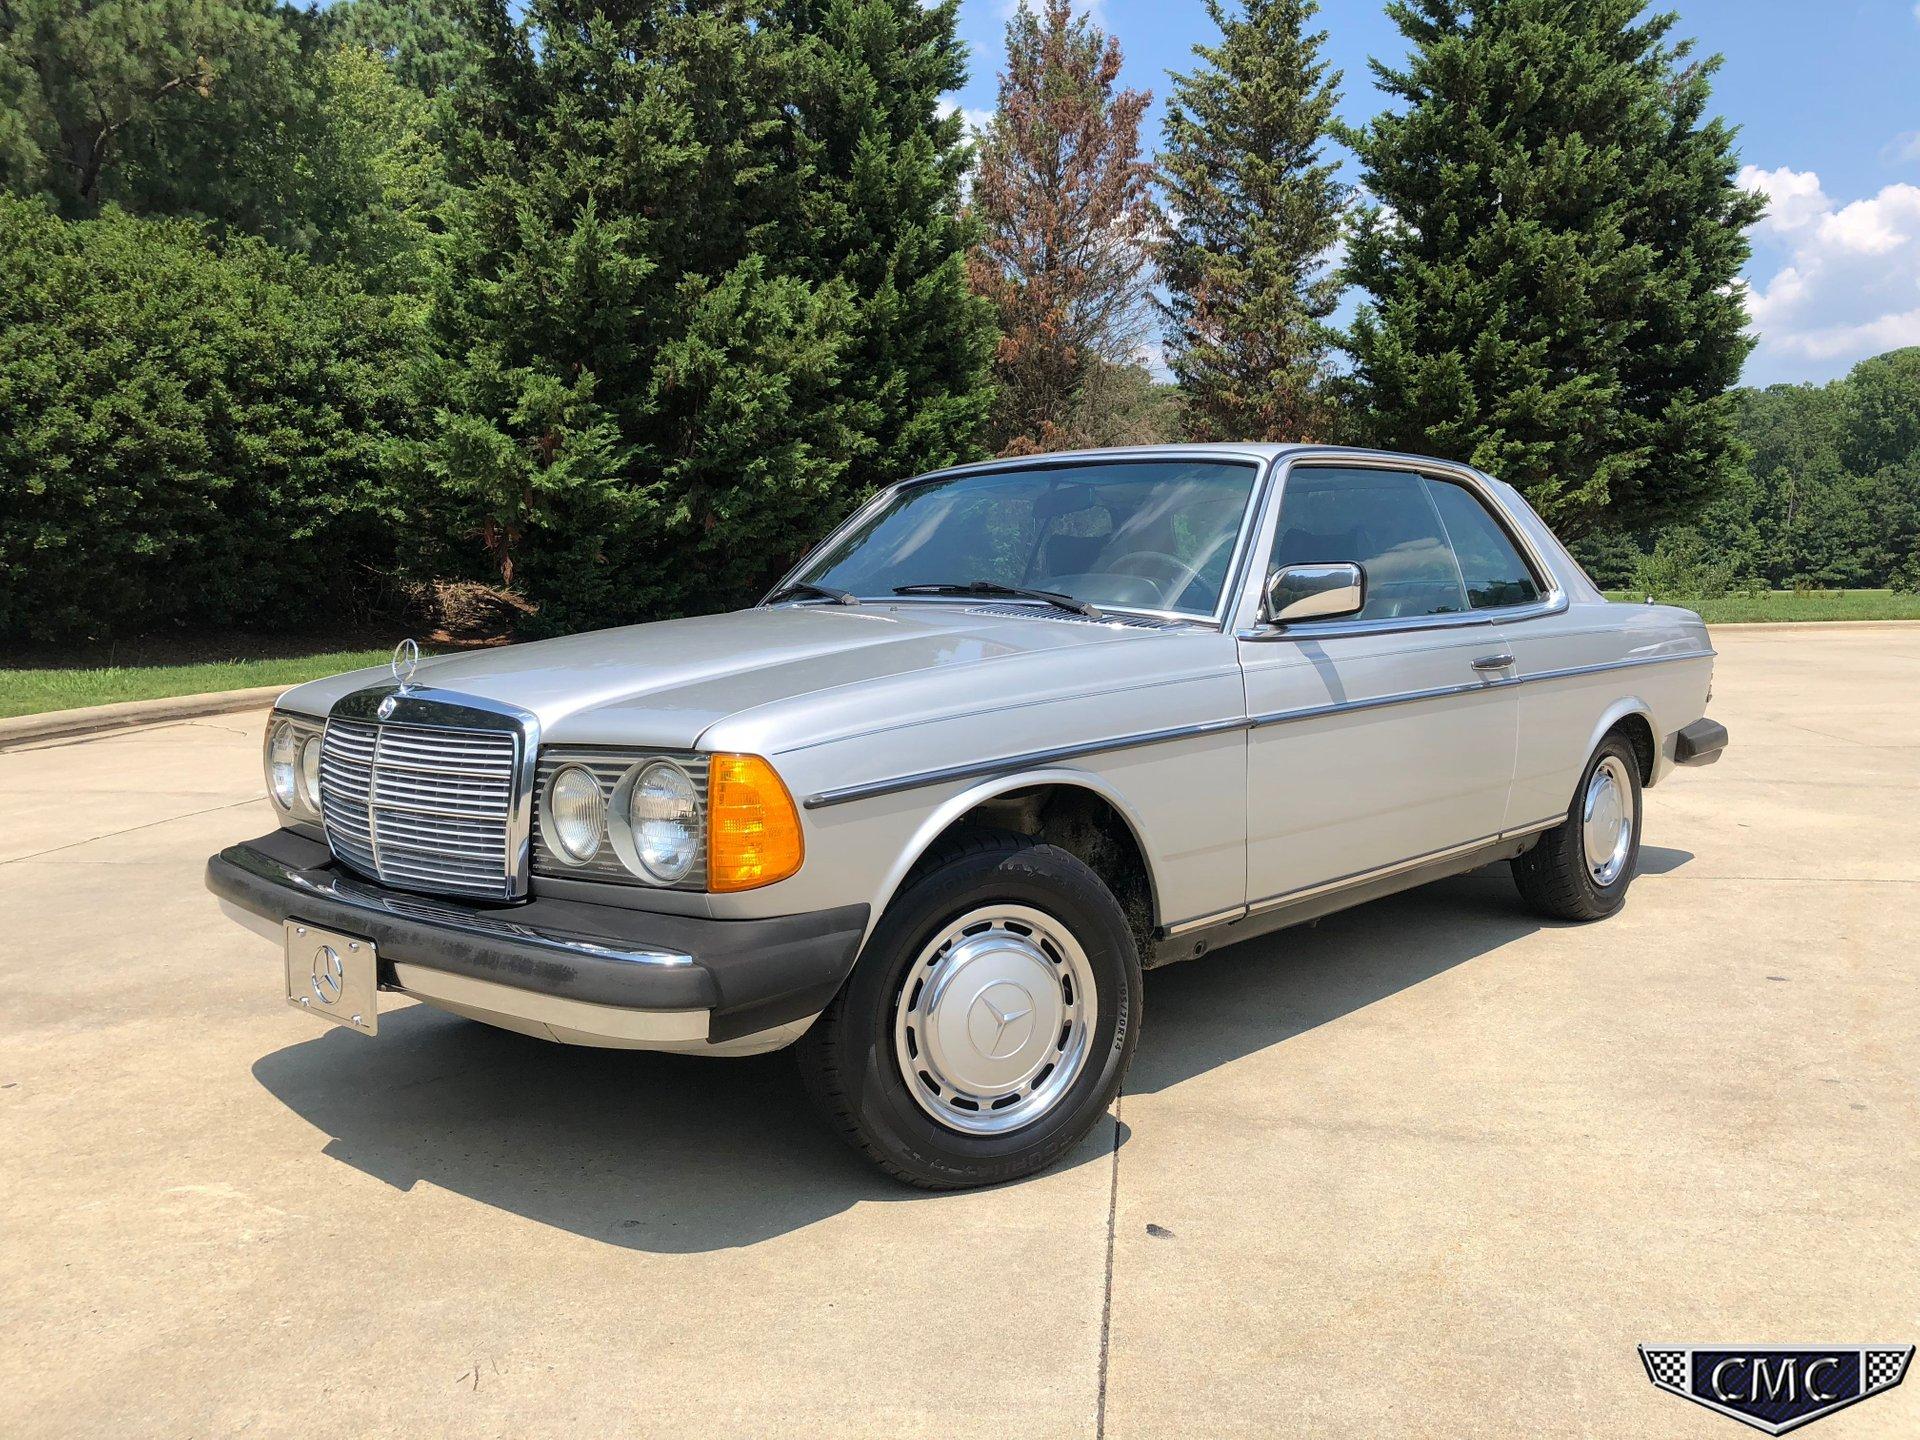 1978 Mercedes-Benz 280CE | Carolina Muscle Cars Inc